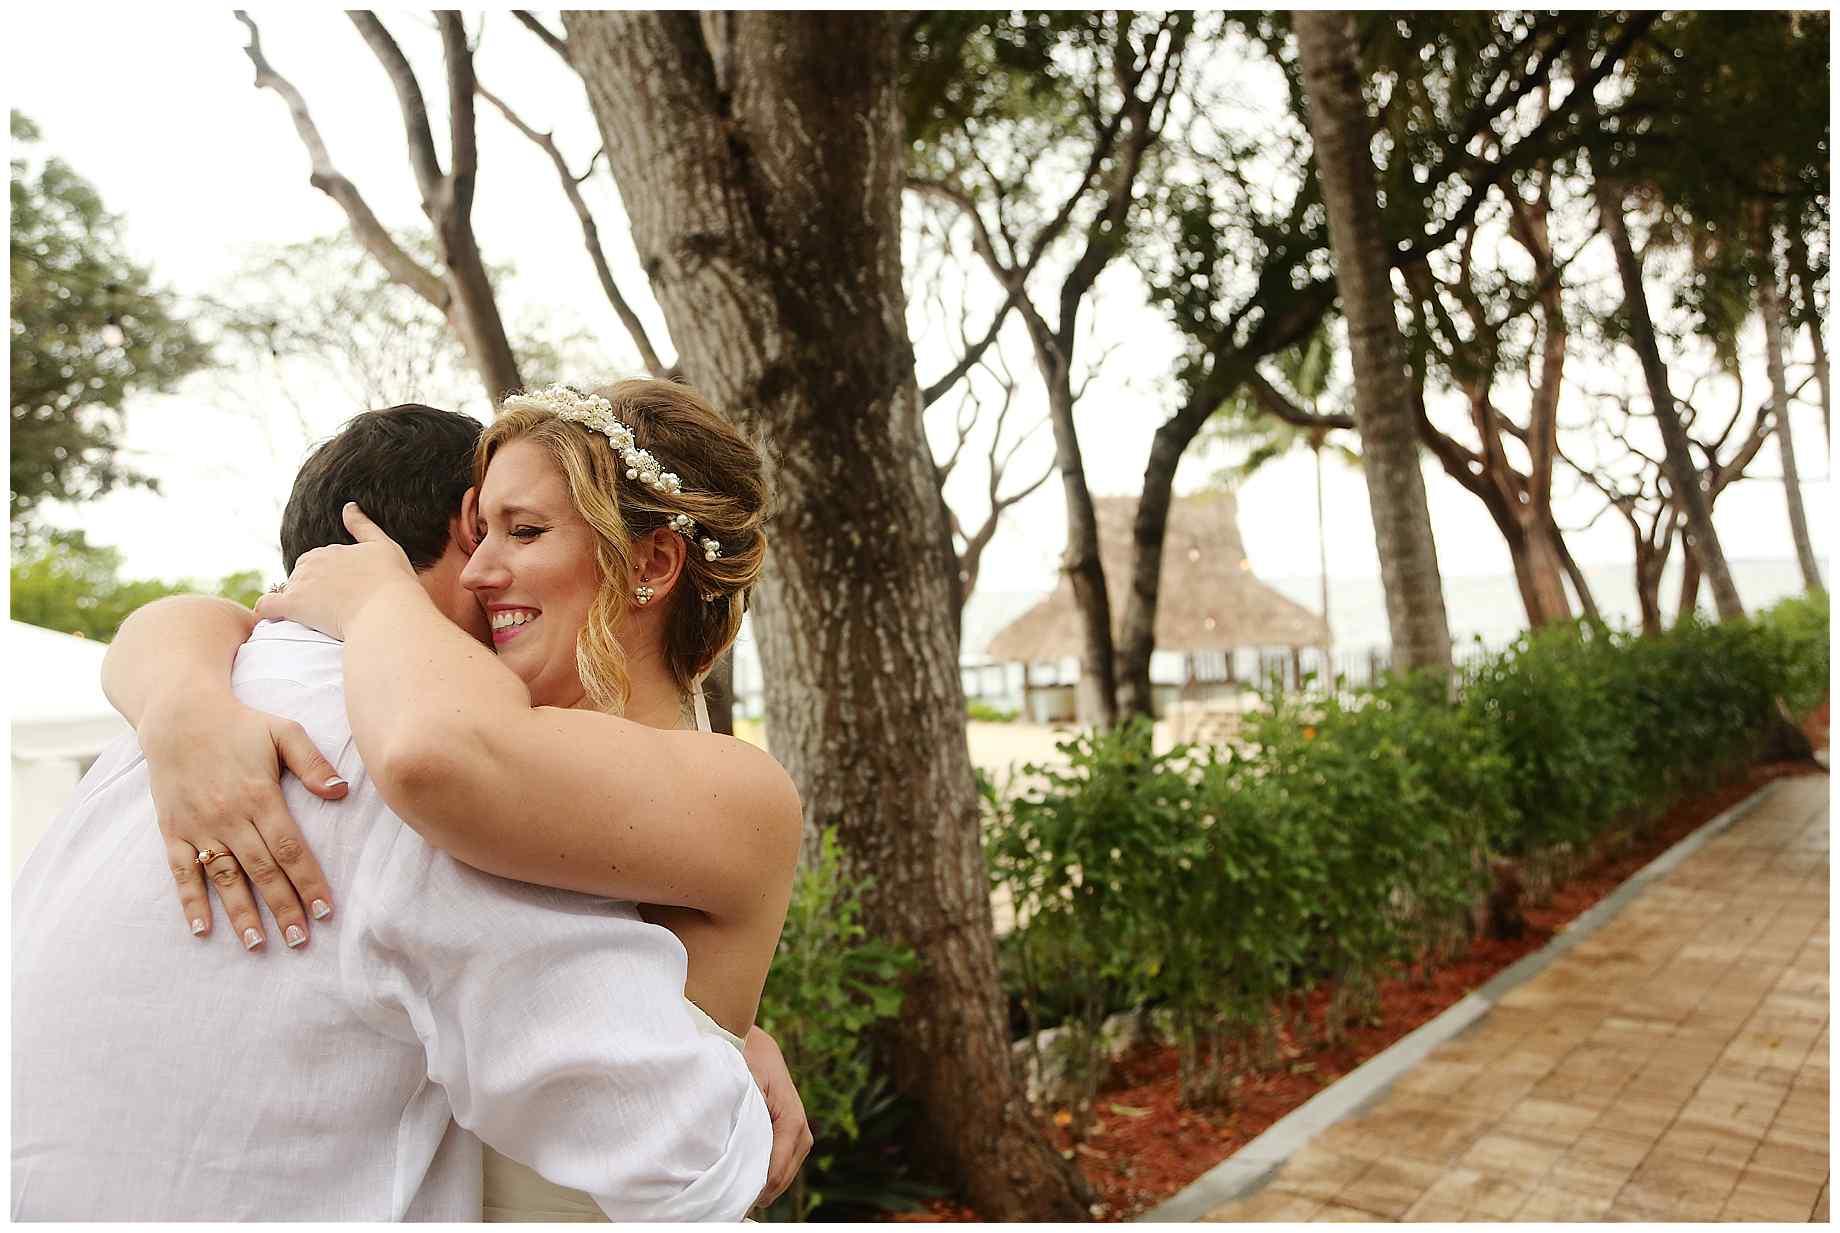 Key-Largo-Beach-Wedding-Photos-025